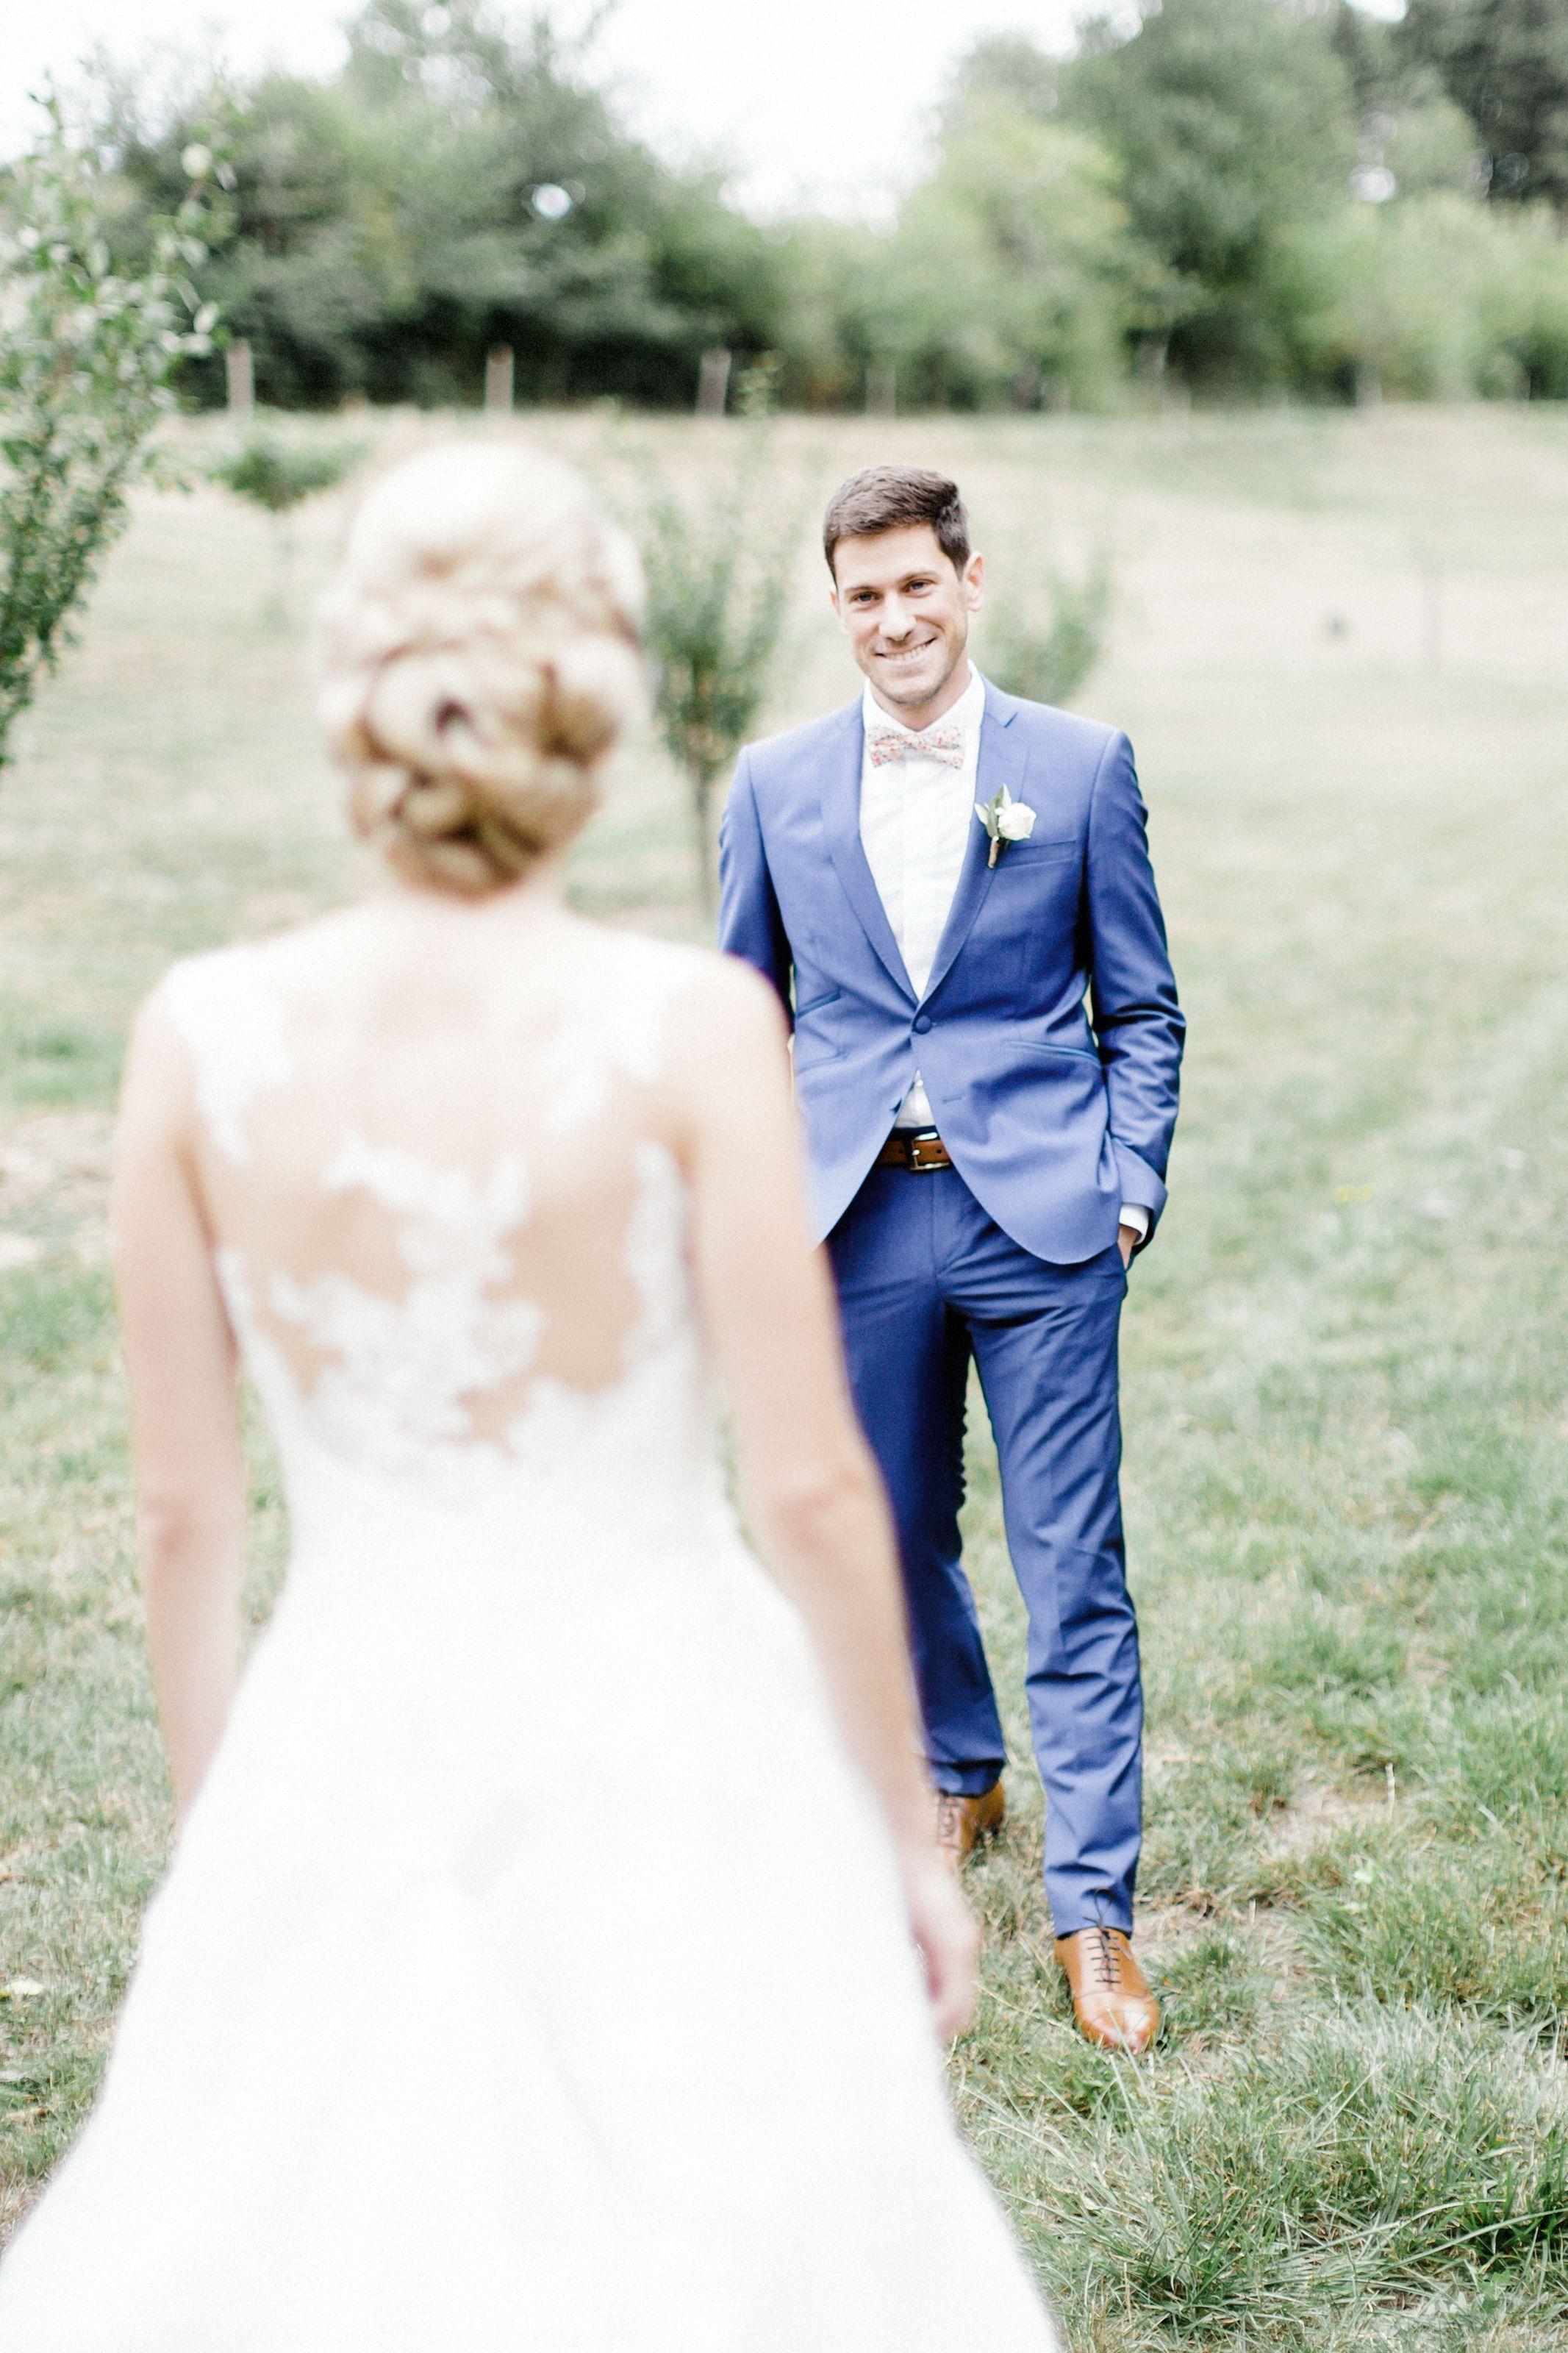 Fine Art Wedding Photographer Instagram Soufianezaidi Photographe Mariage Mariage Photographie